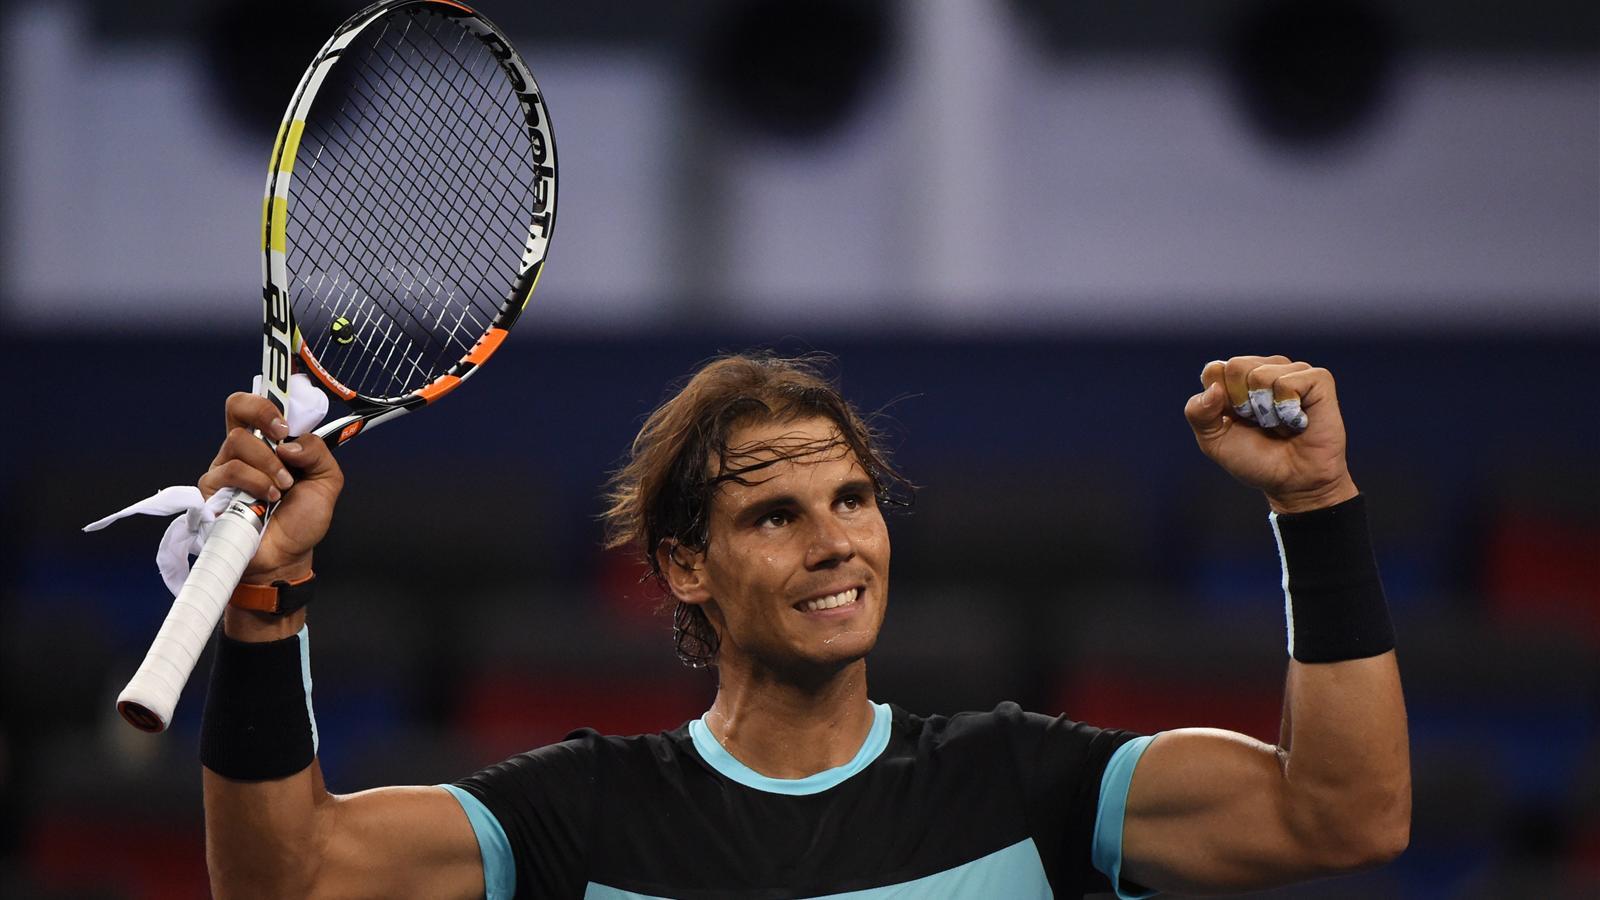 Rafael Nadal celebrates his huge win over Stanislas Wawrinka in Shanghai.